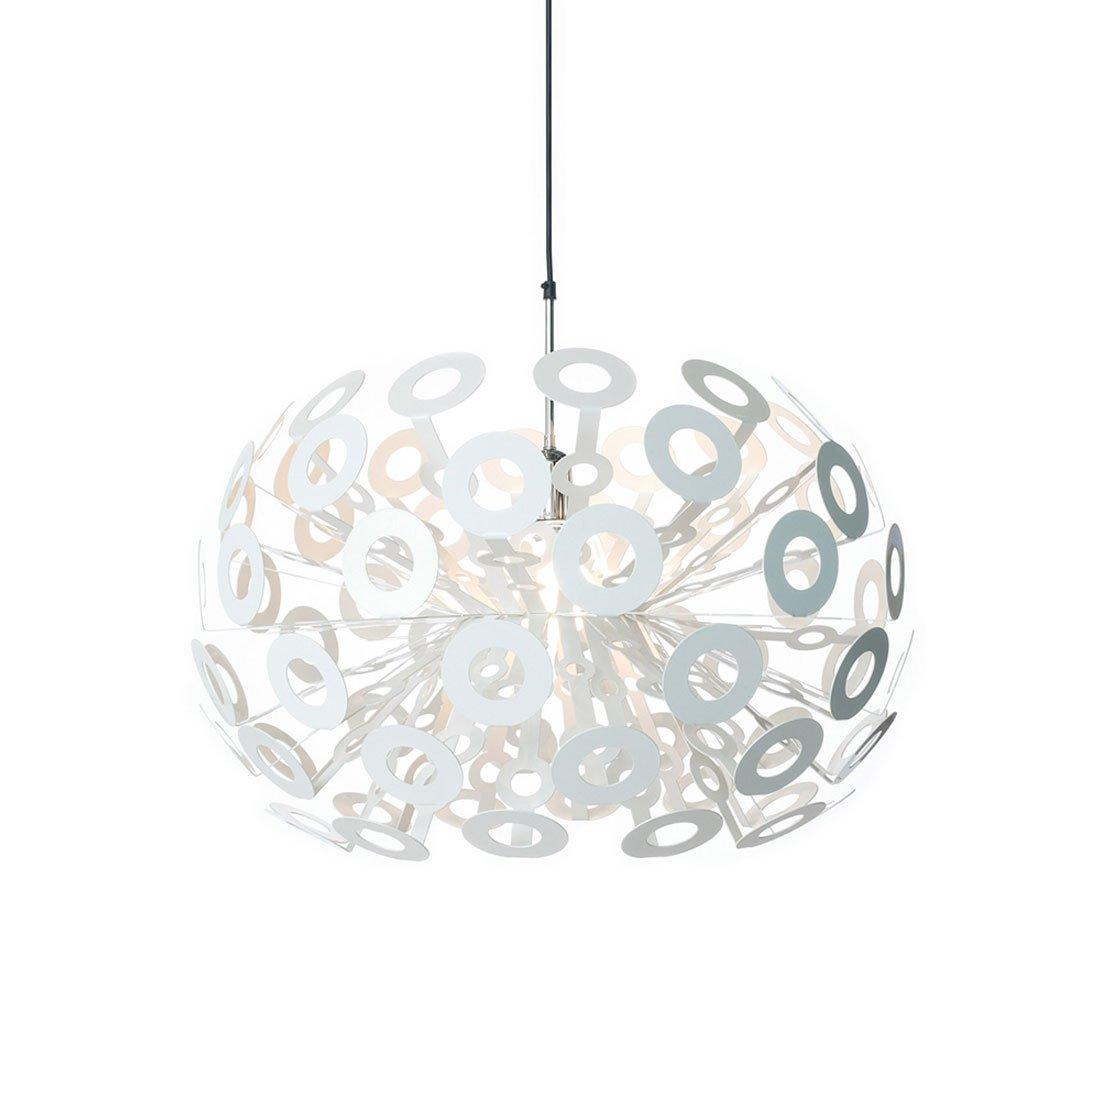 Moooi Dandelion Hanglamp